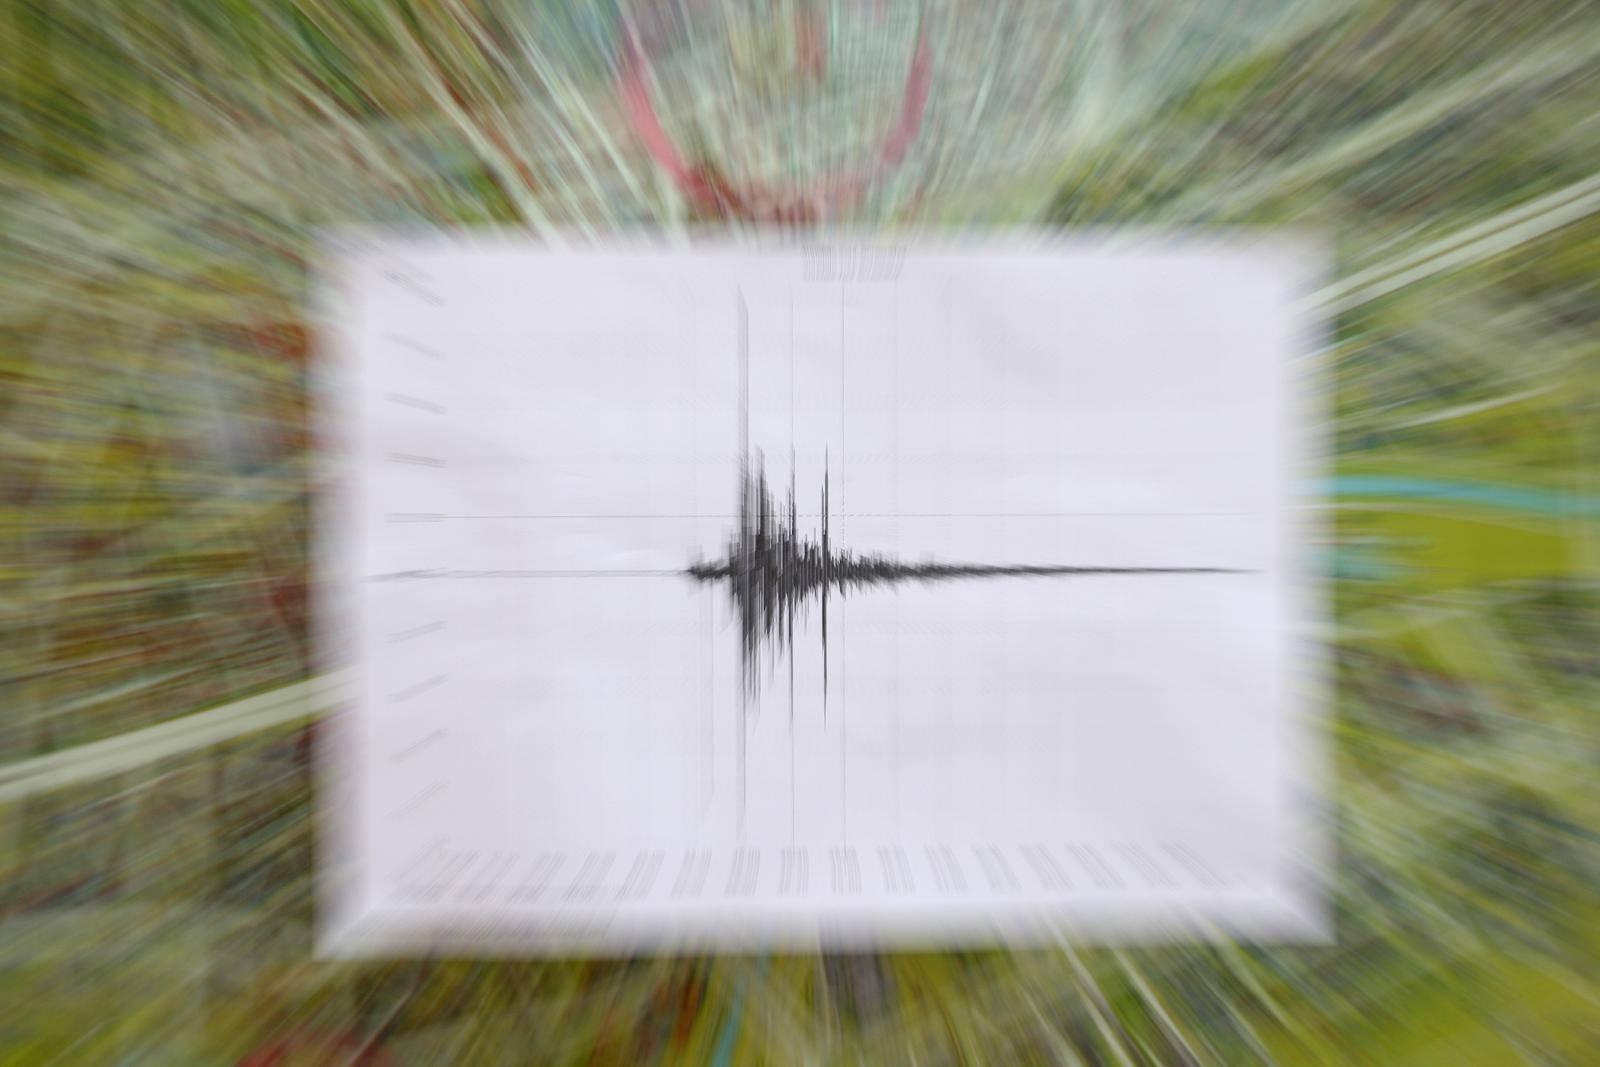 Seizmološka služba: Potres kod Metkovića, magnituda 3,1